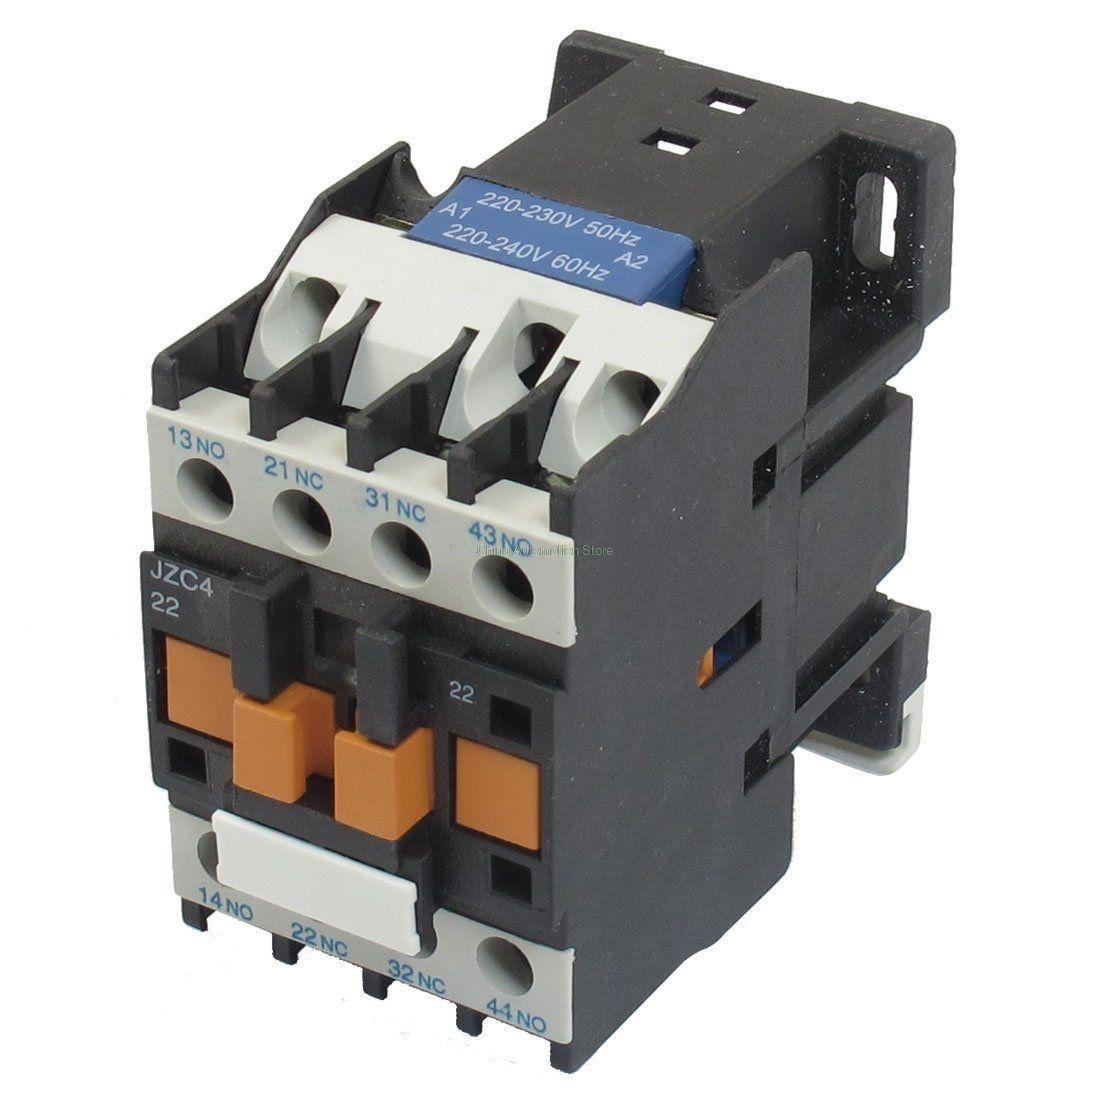 imc hot jzc4-22 220-240v 50/60hz coil 20a 2p three pole 2no 2nc ac contactor